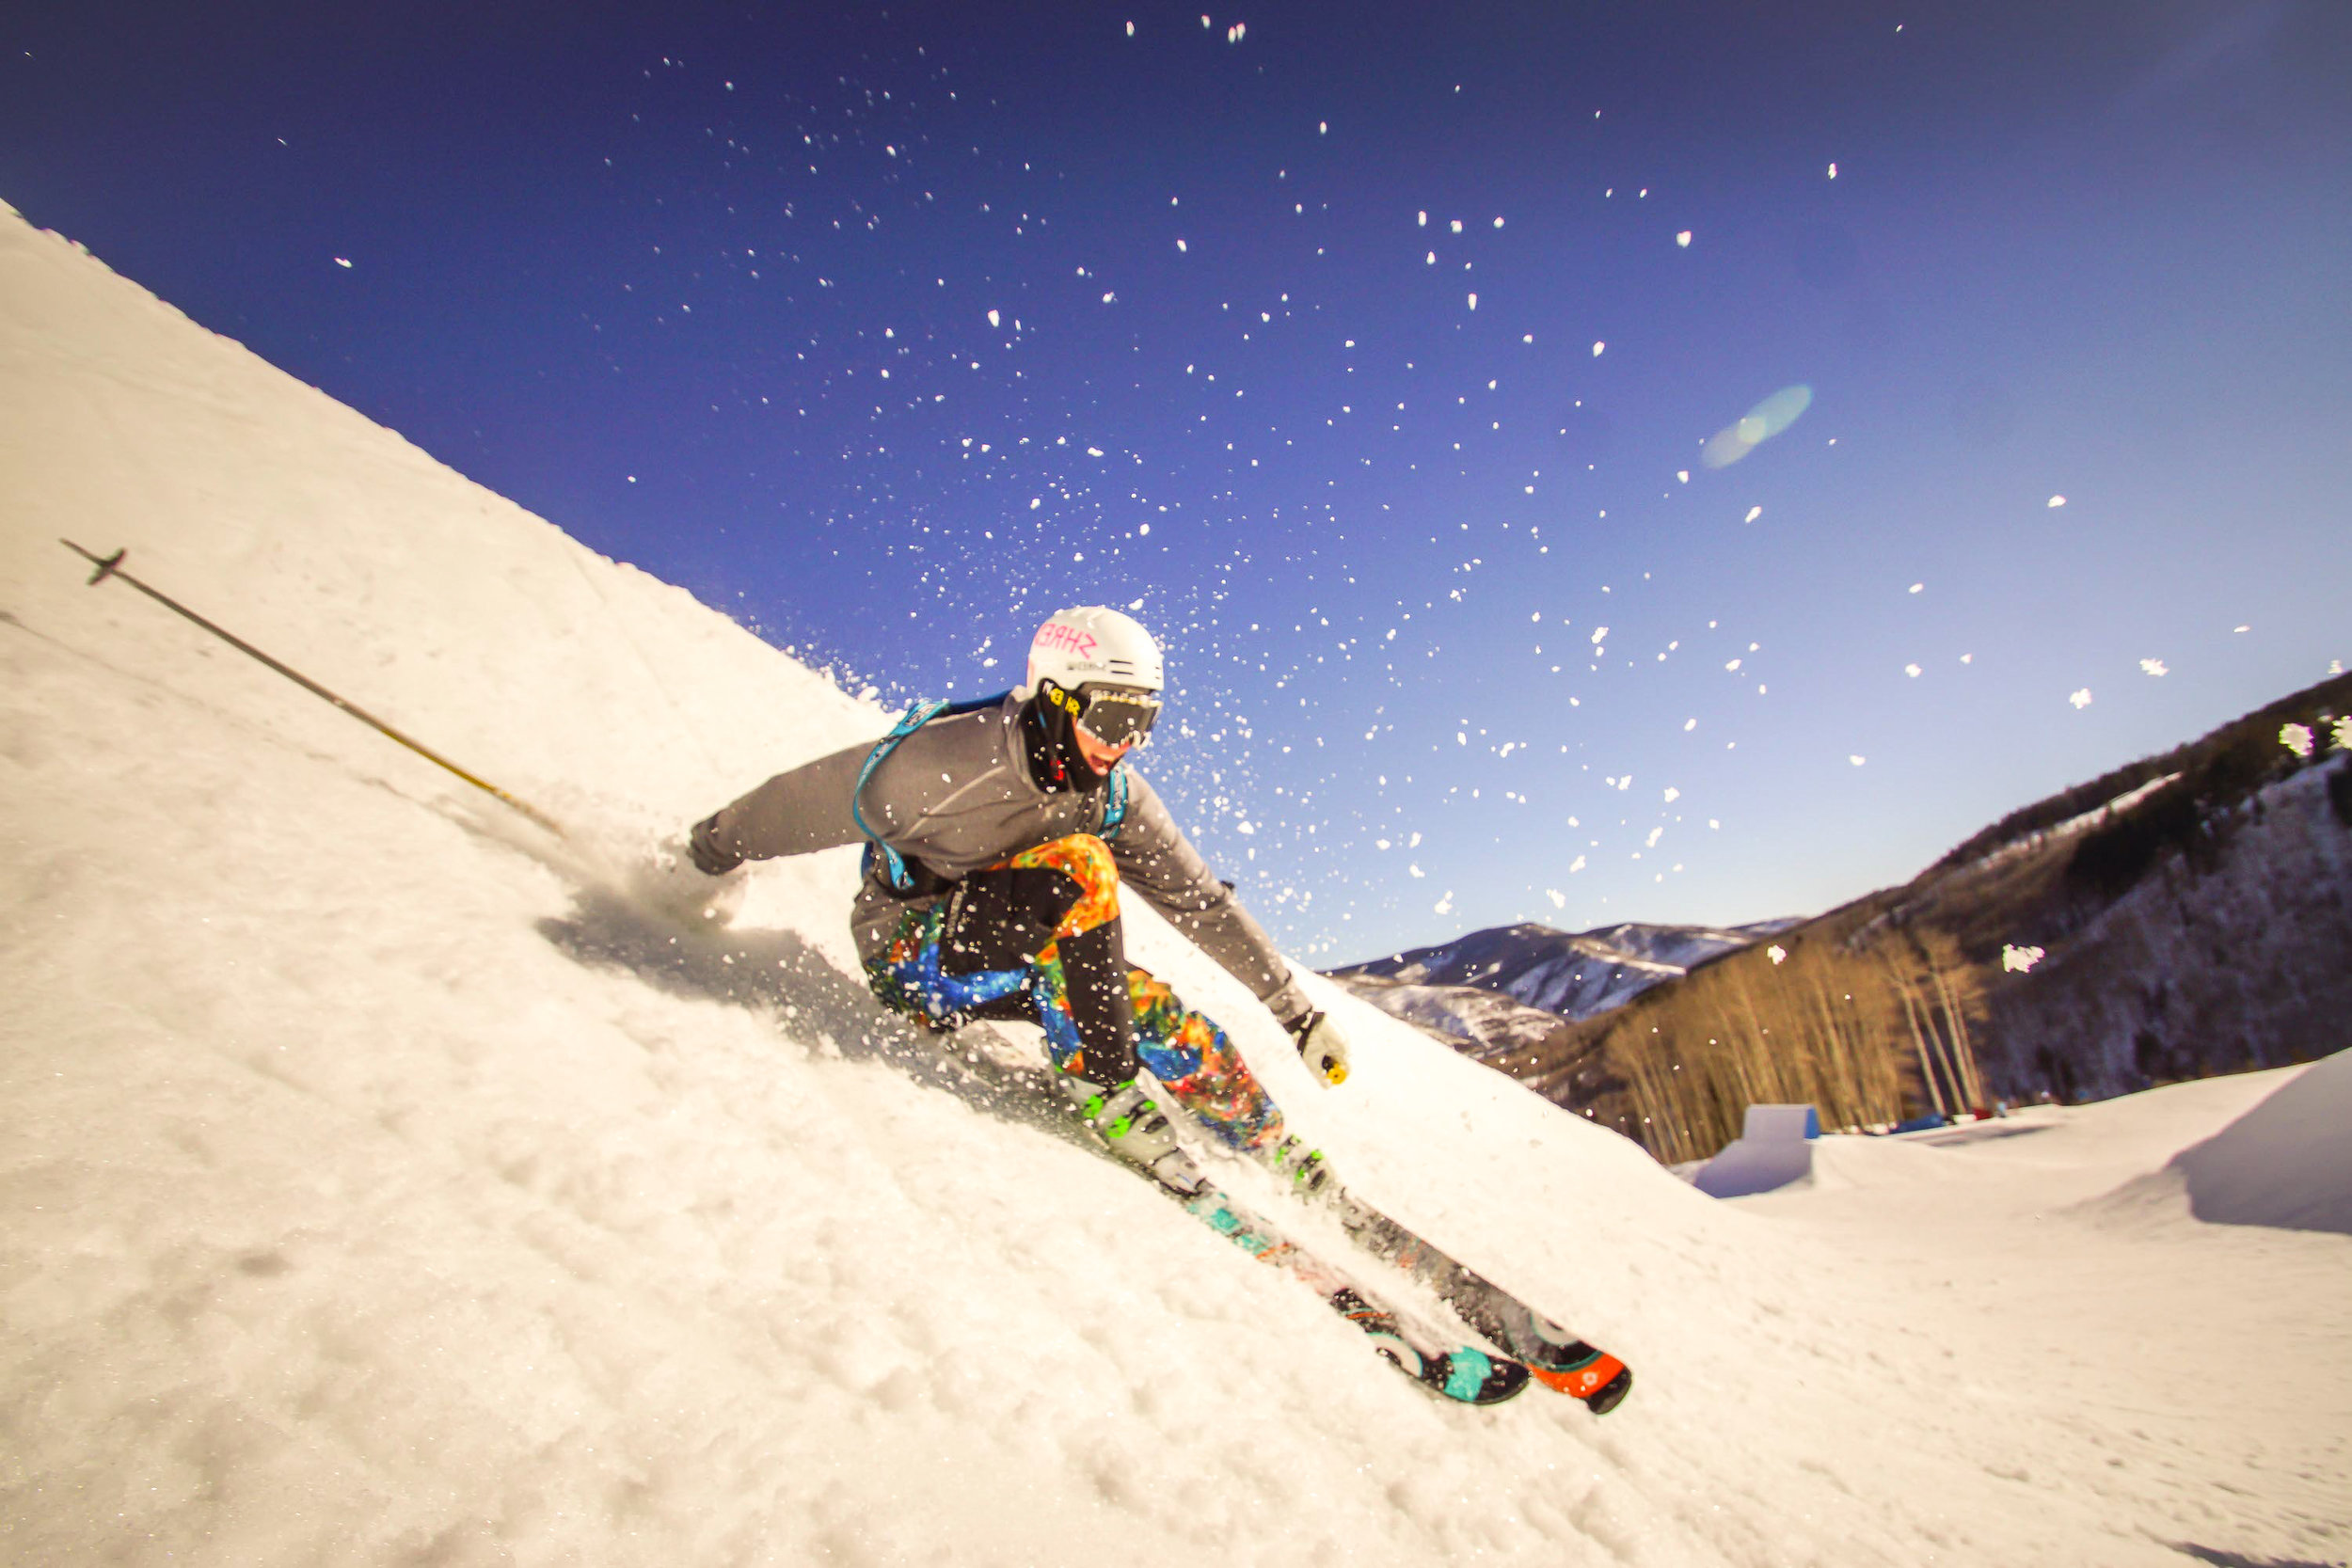 Male Professional Skier Photo